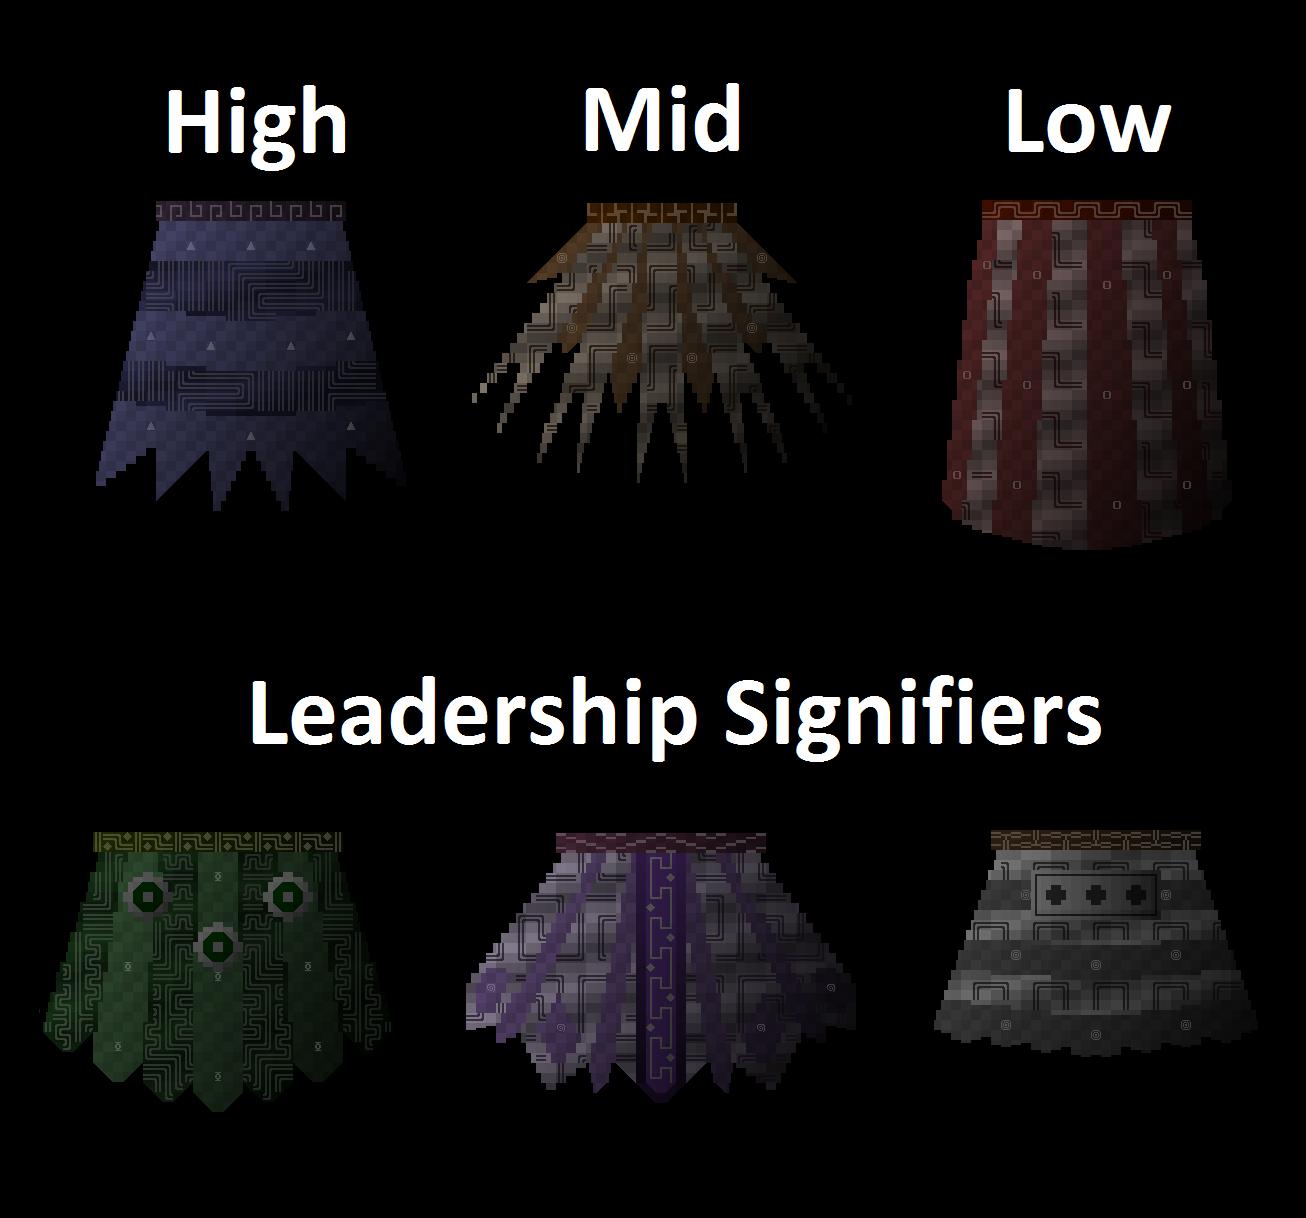 Tribal lowers